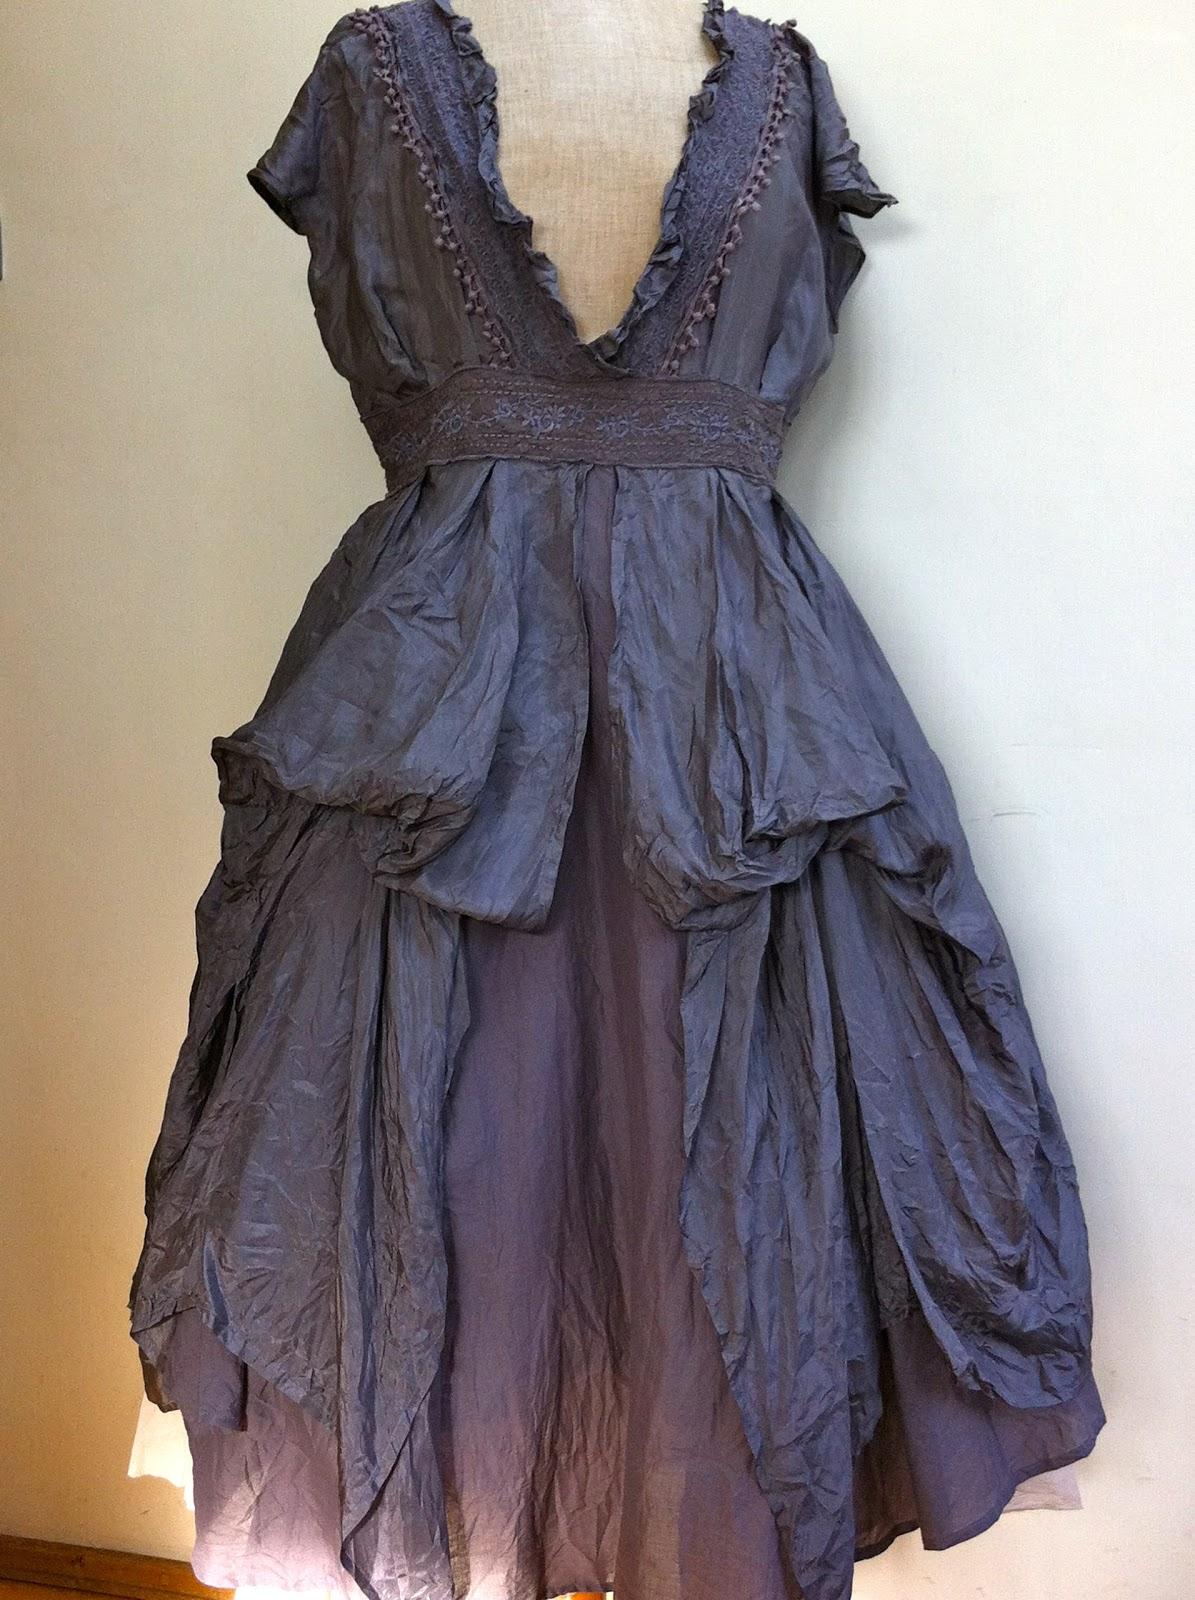 SESAME-CLOTHING...: EWA I WALLA SS12...75